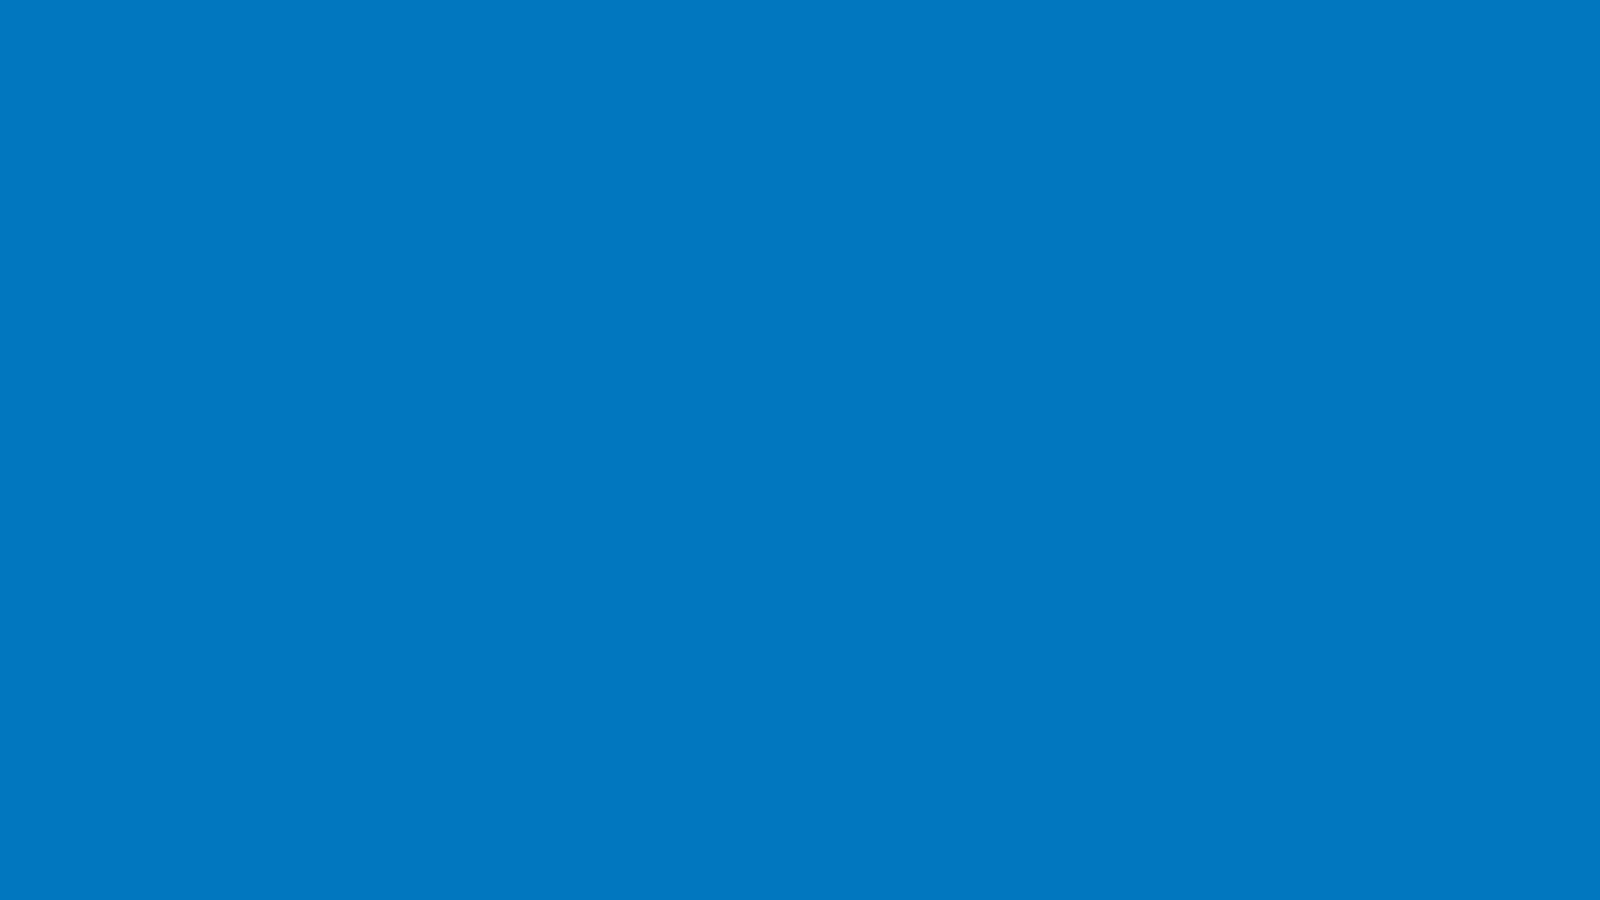 1600x900 Ocean Boat Blue Solid Color Background